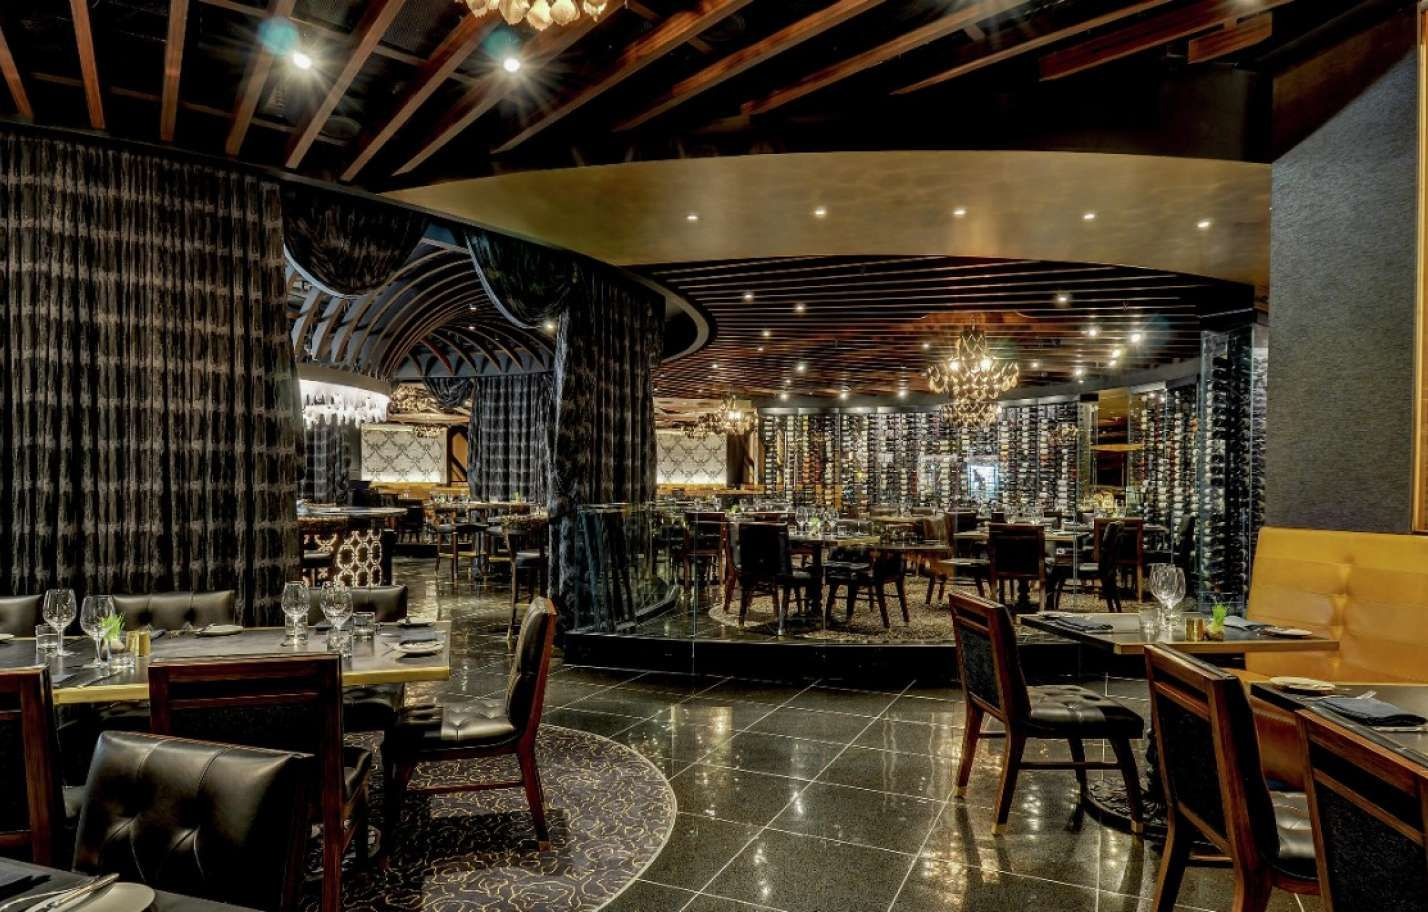 Steak Restaurant Jean Georges Steakhouse Aria Resort Casino Vegas Restaurants Steakhouse Aria Las Vegas